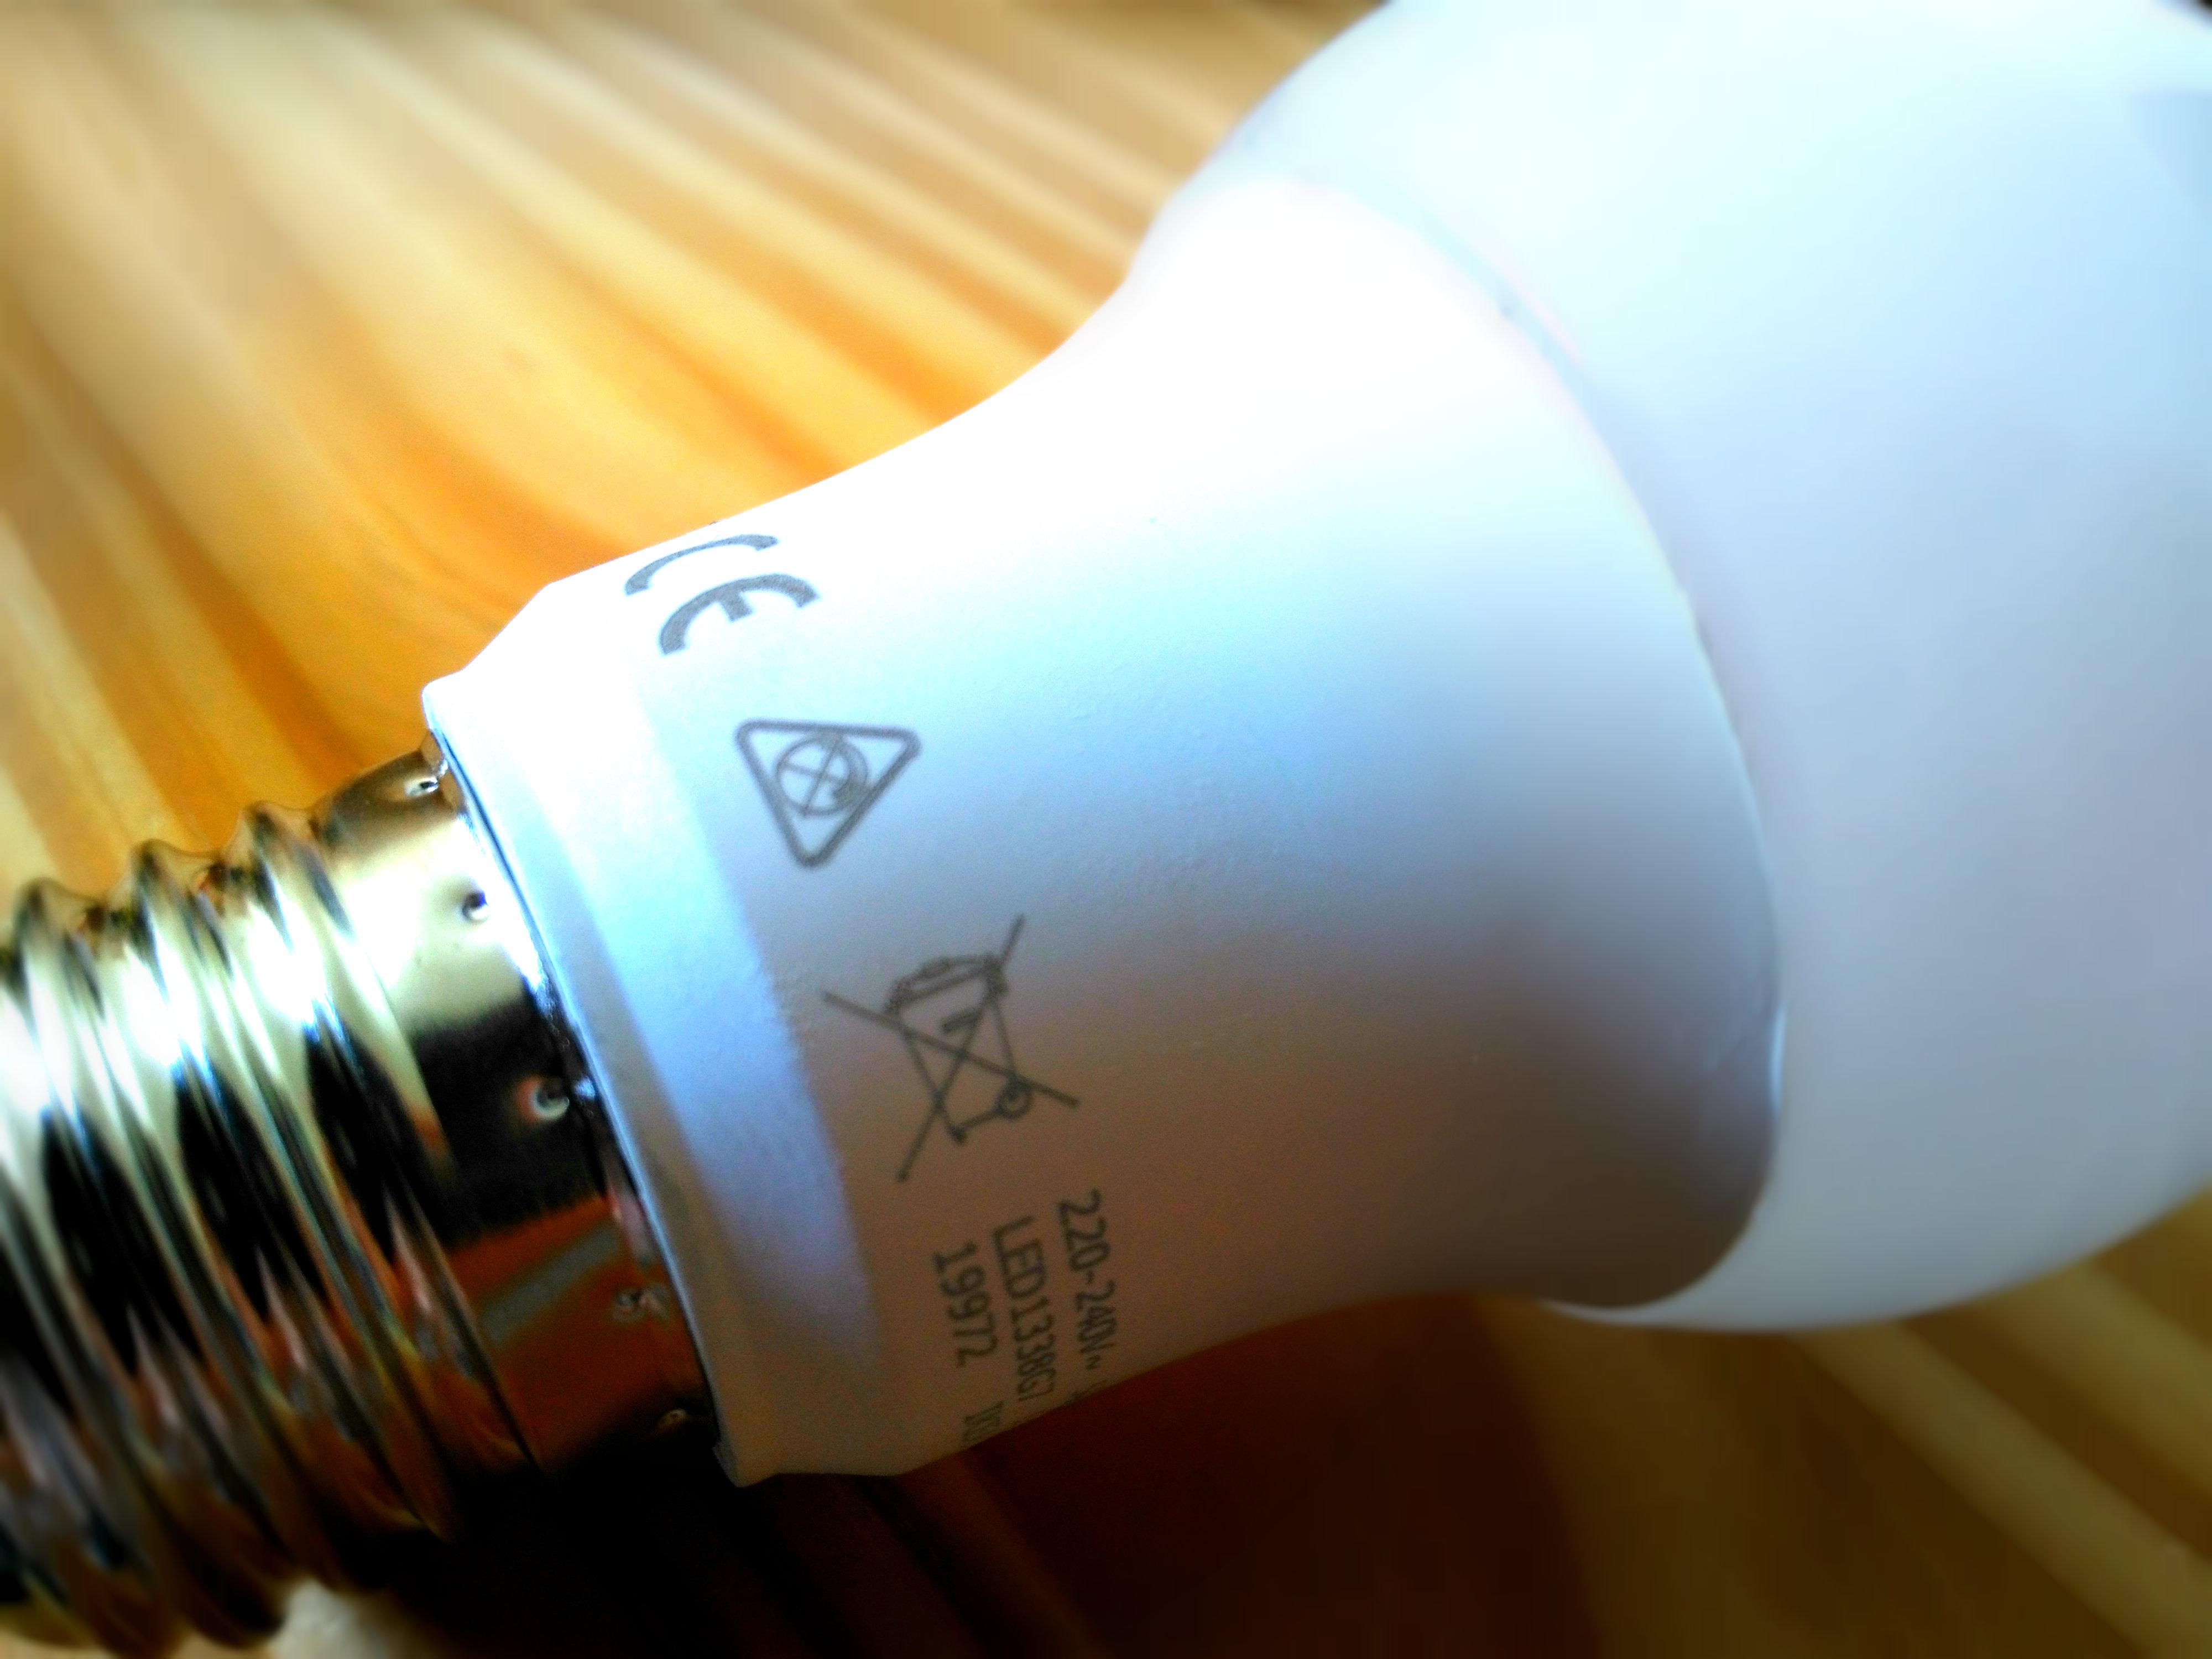 Quale lampadina usare?